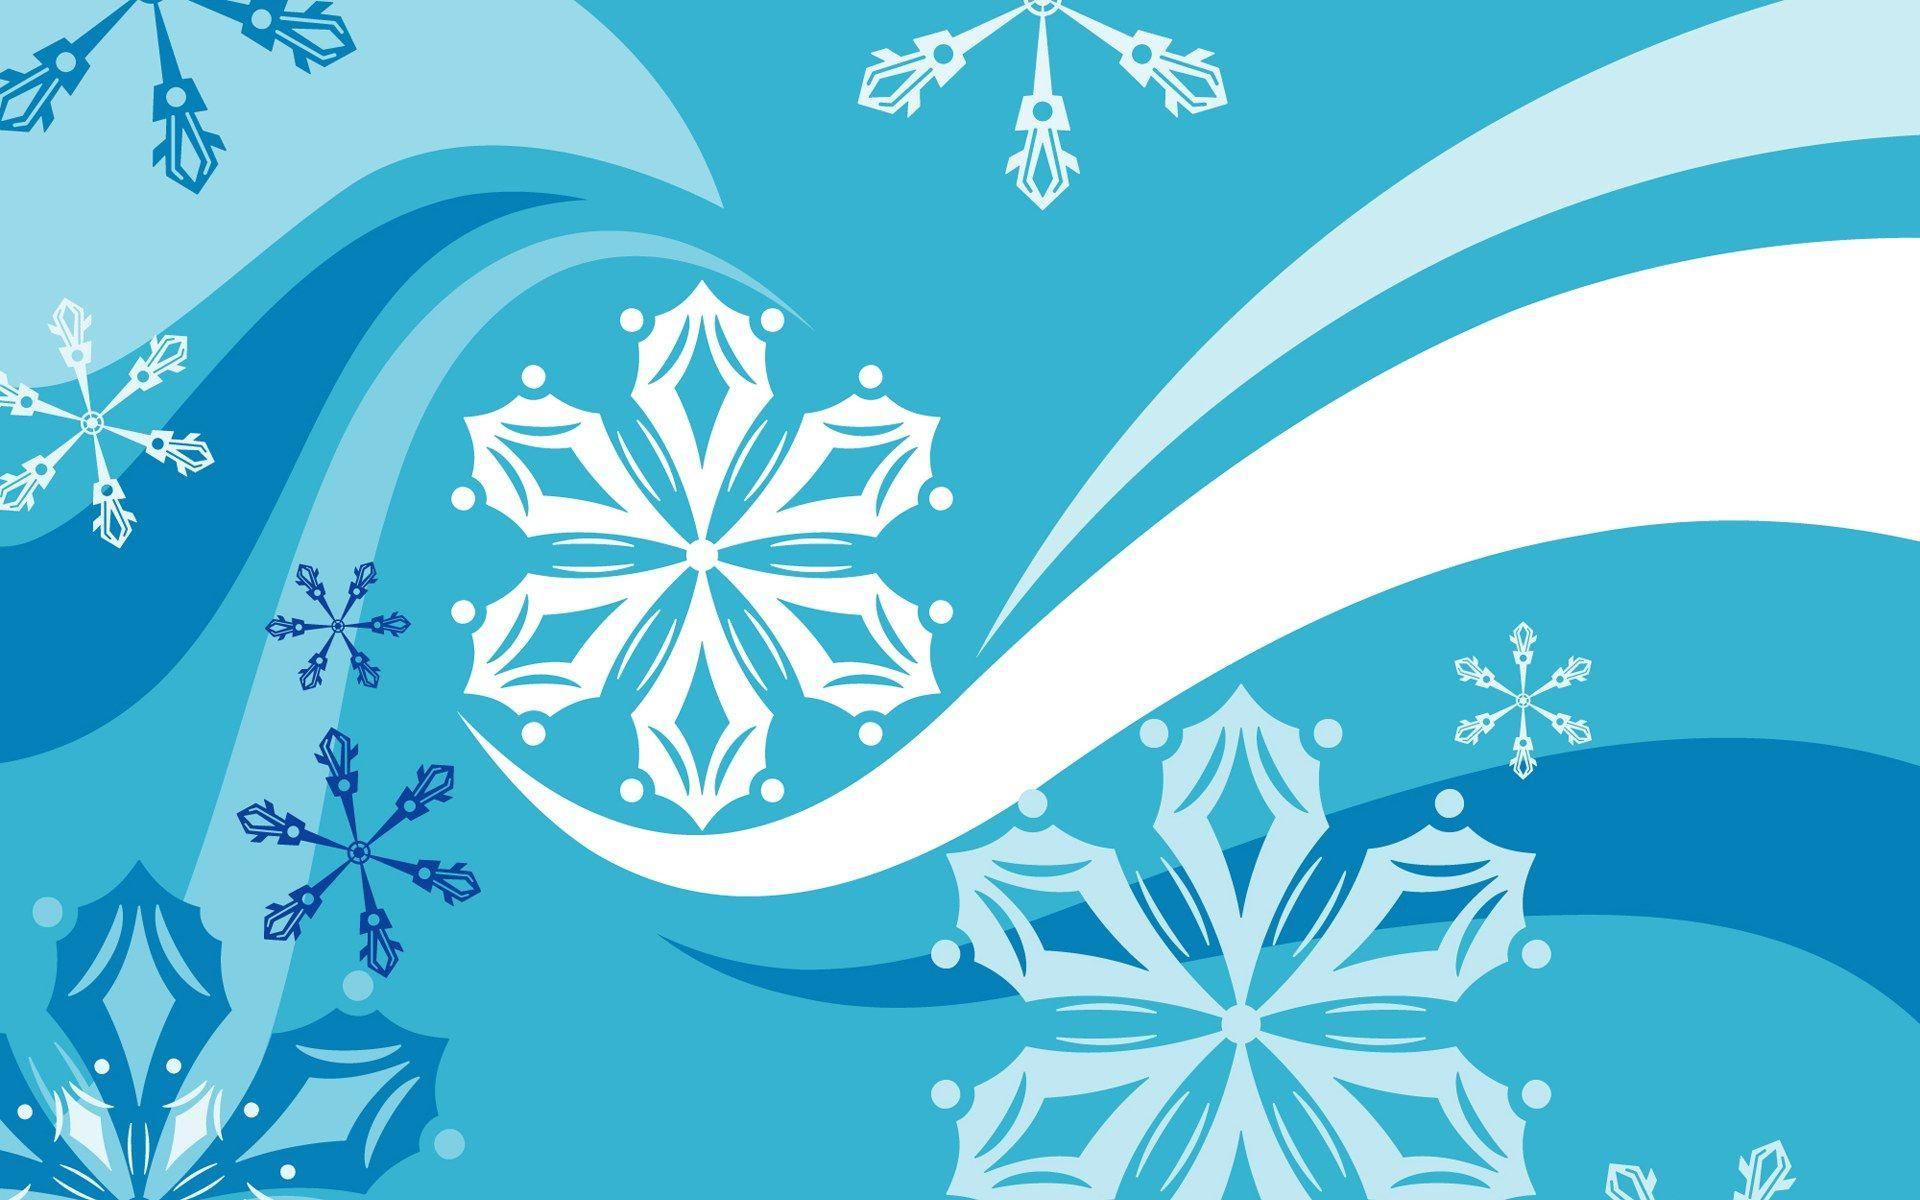 Winter Cartoon Wallpapers - Wallpaper Cave